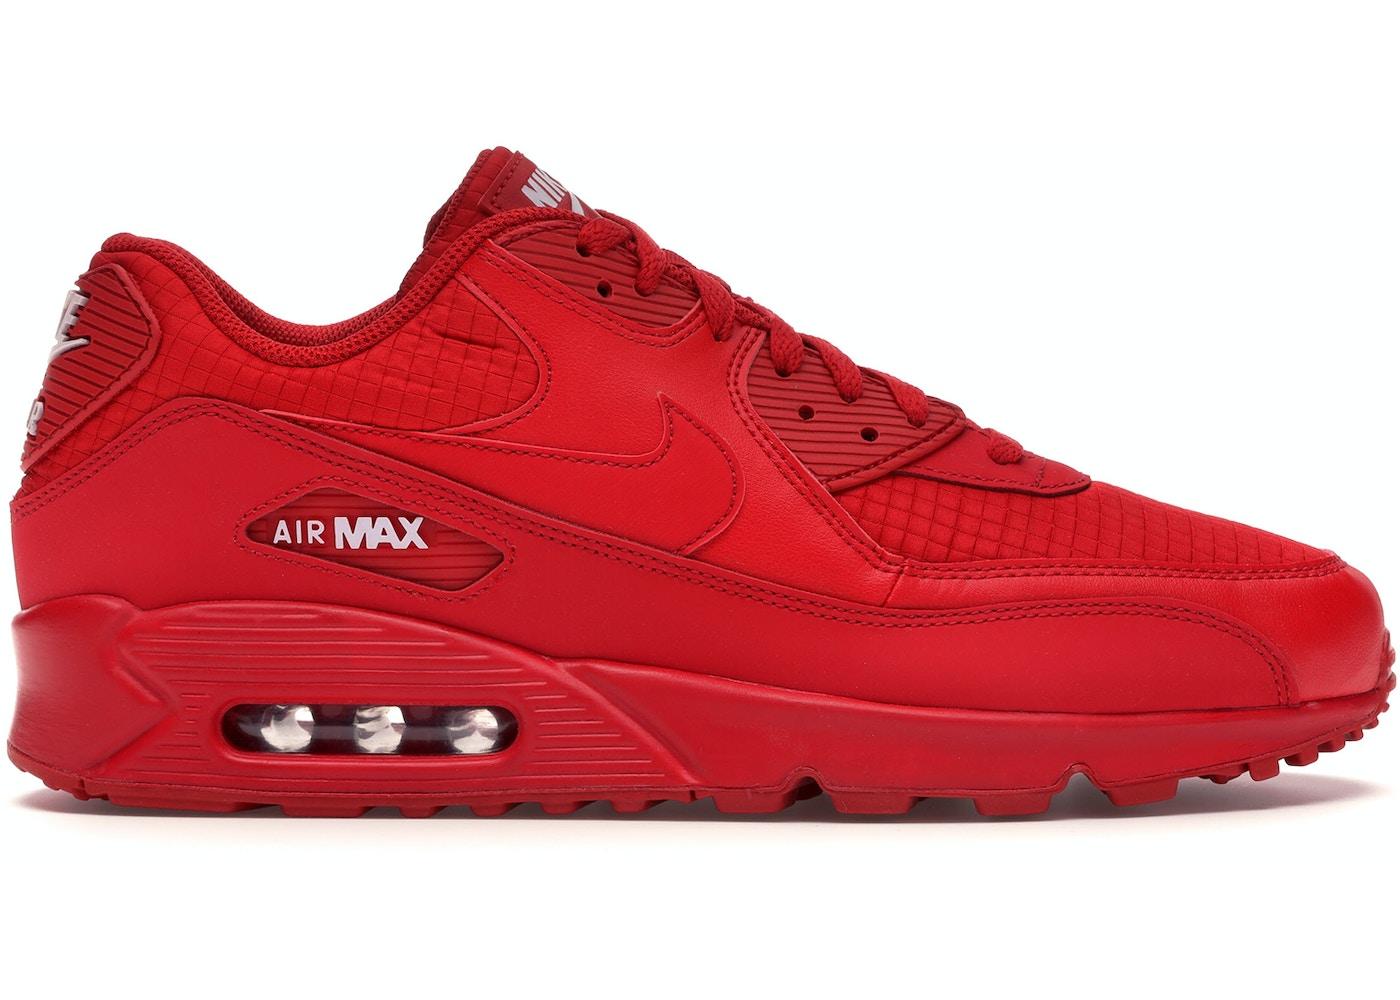 Ordenado Fielmente mercado  Nike Air Max 90 Triple Red - AJ1285-602